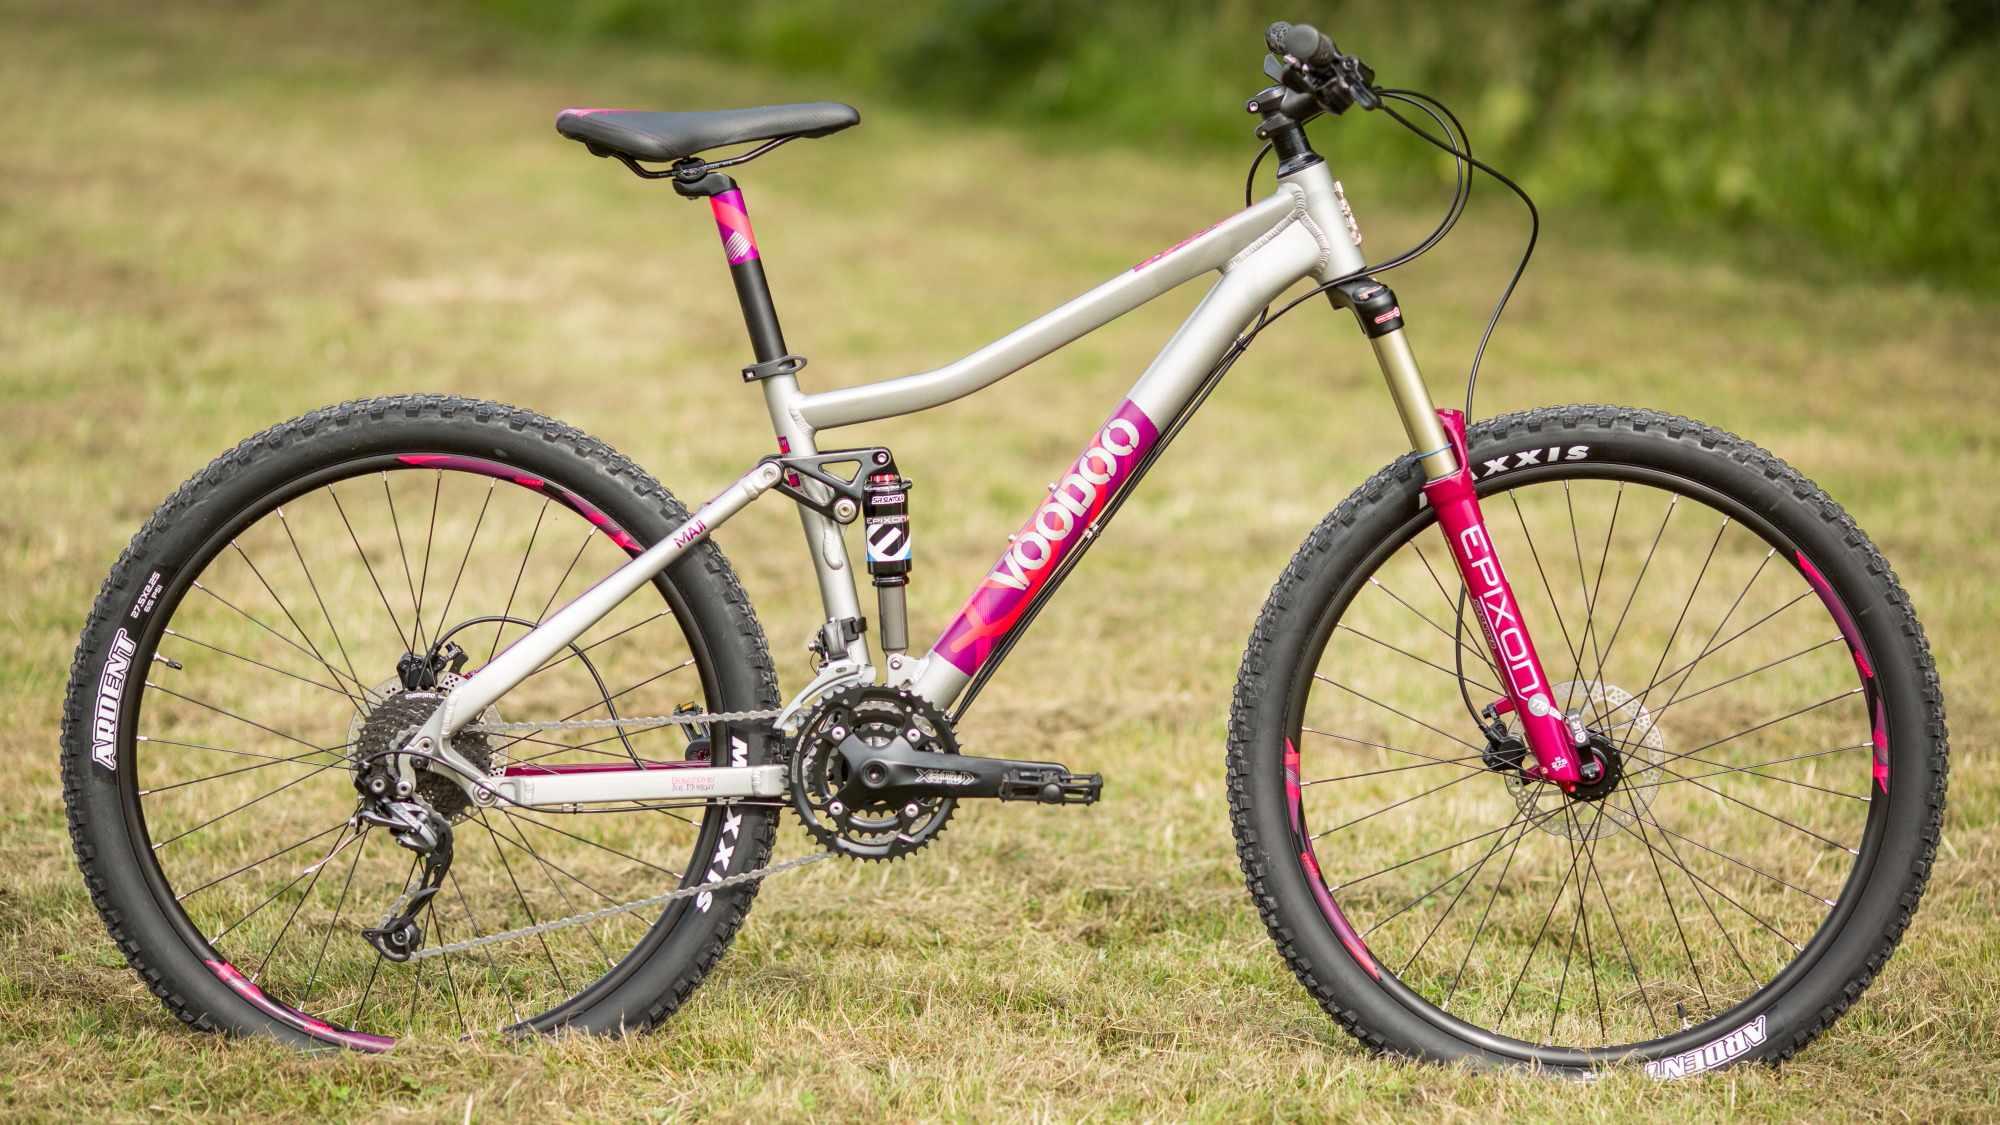 The VooDoo Maji women's mountain bike